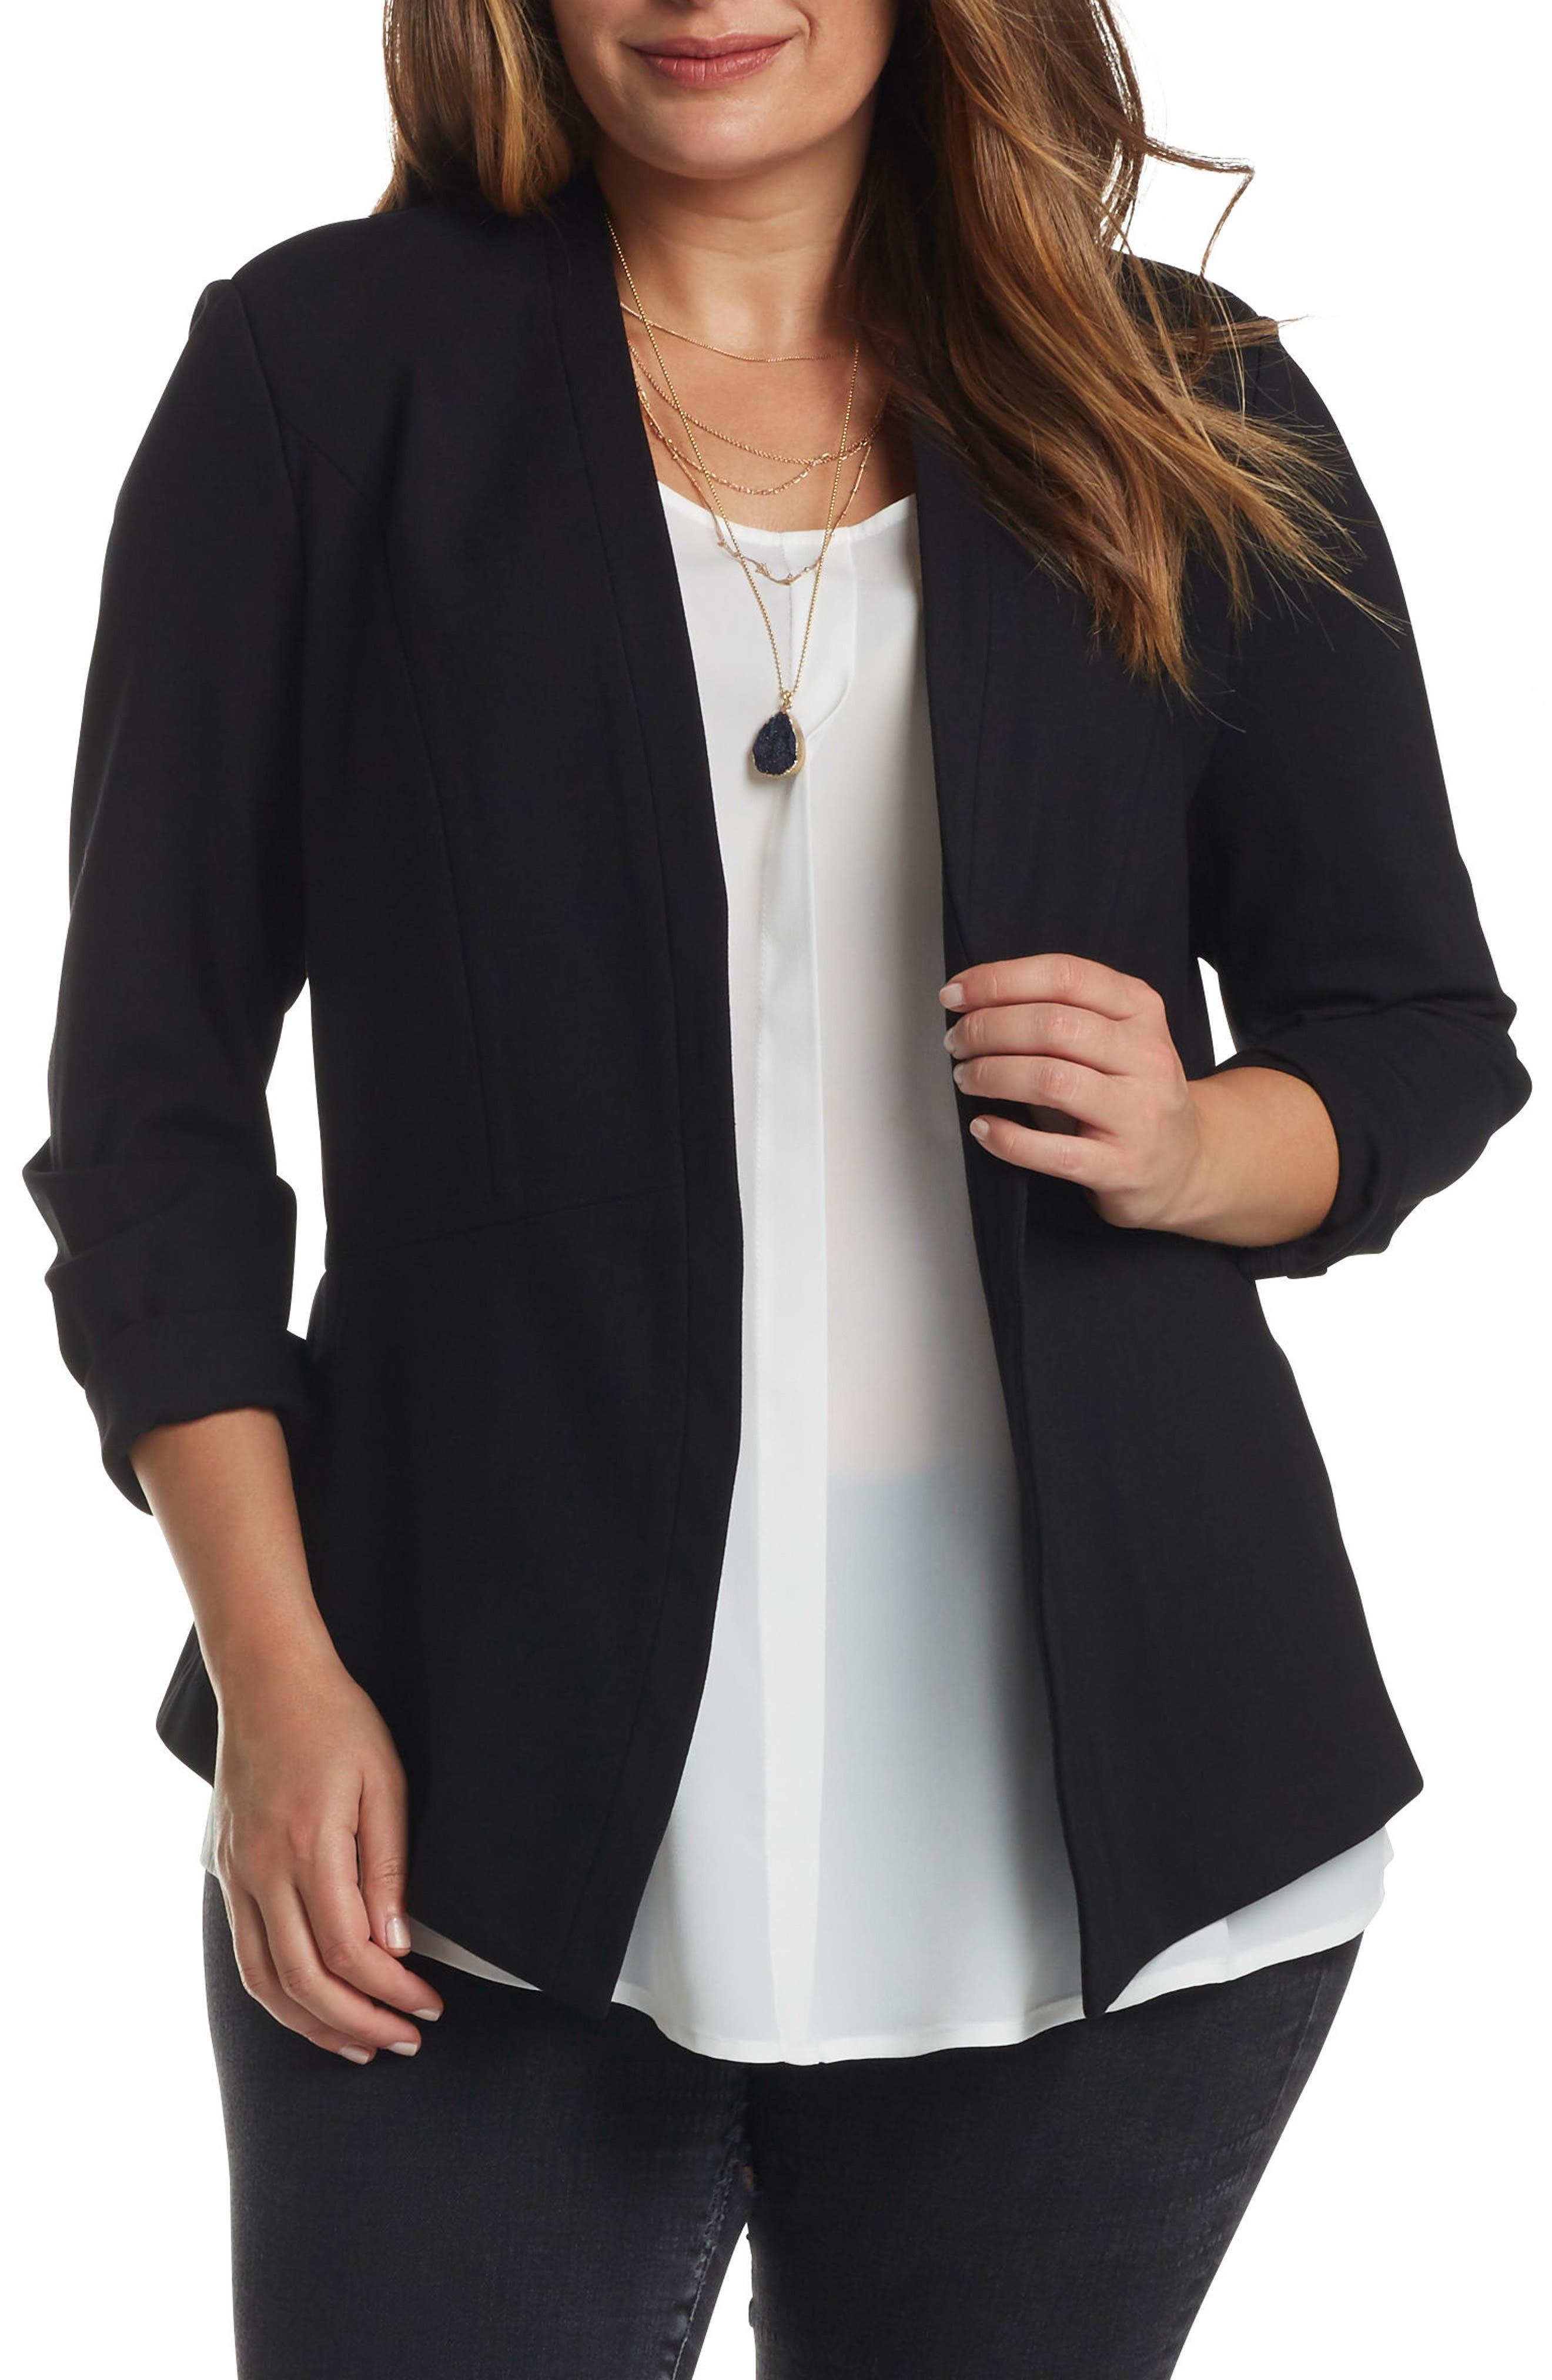 Alternate Image 1 Selected - Tart 'Annabella' Open Front Blazer (Plus Size)